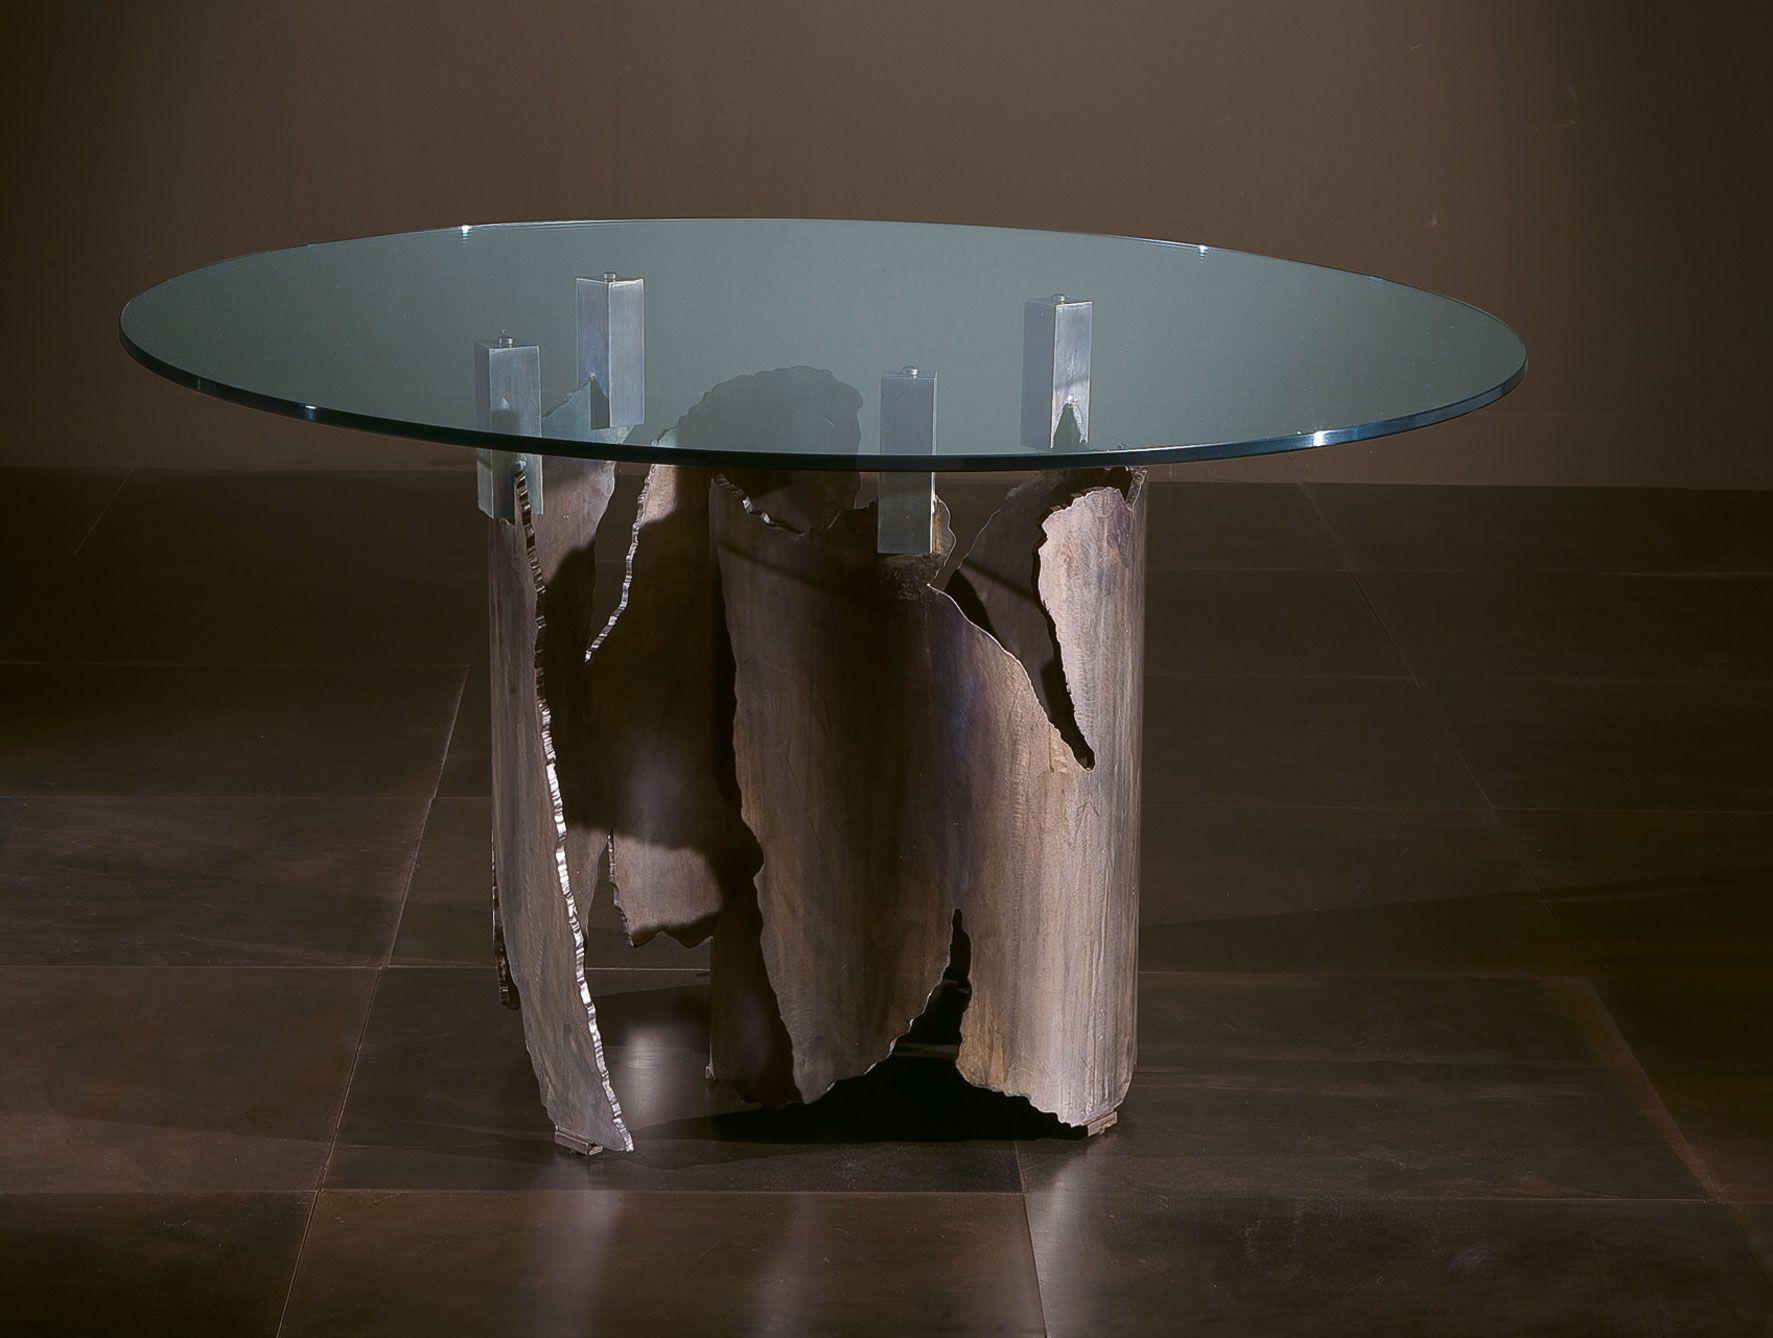 Giorgio 4026 luxury Italian coffee table upholstered in steel